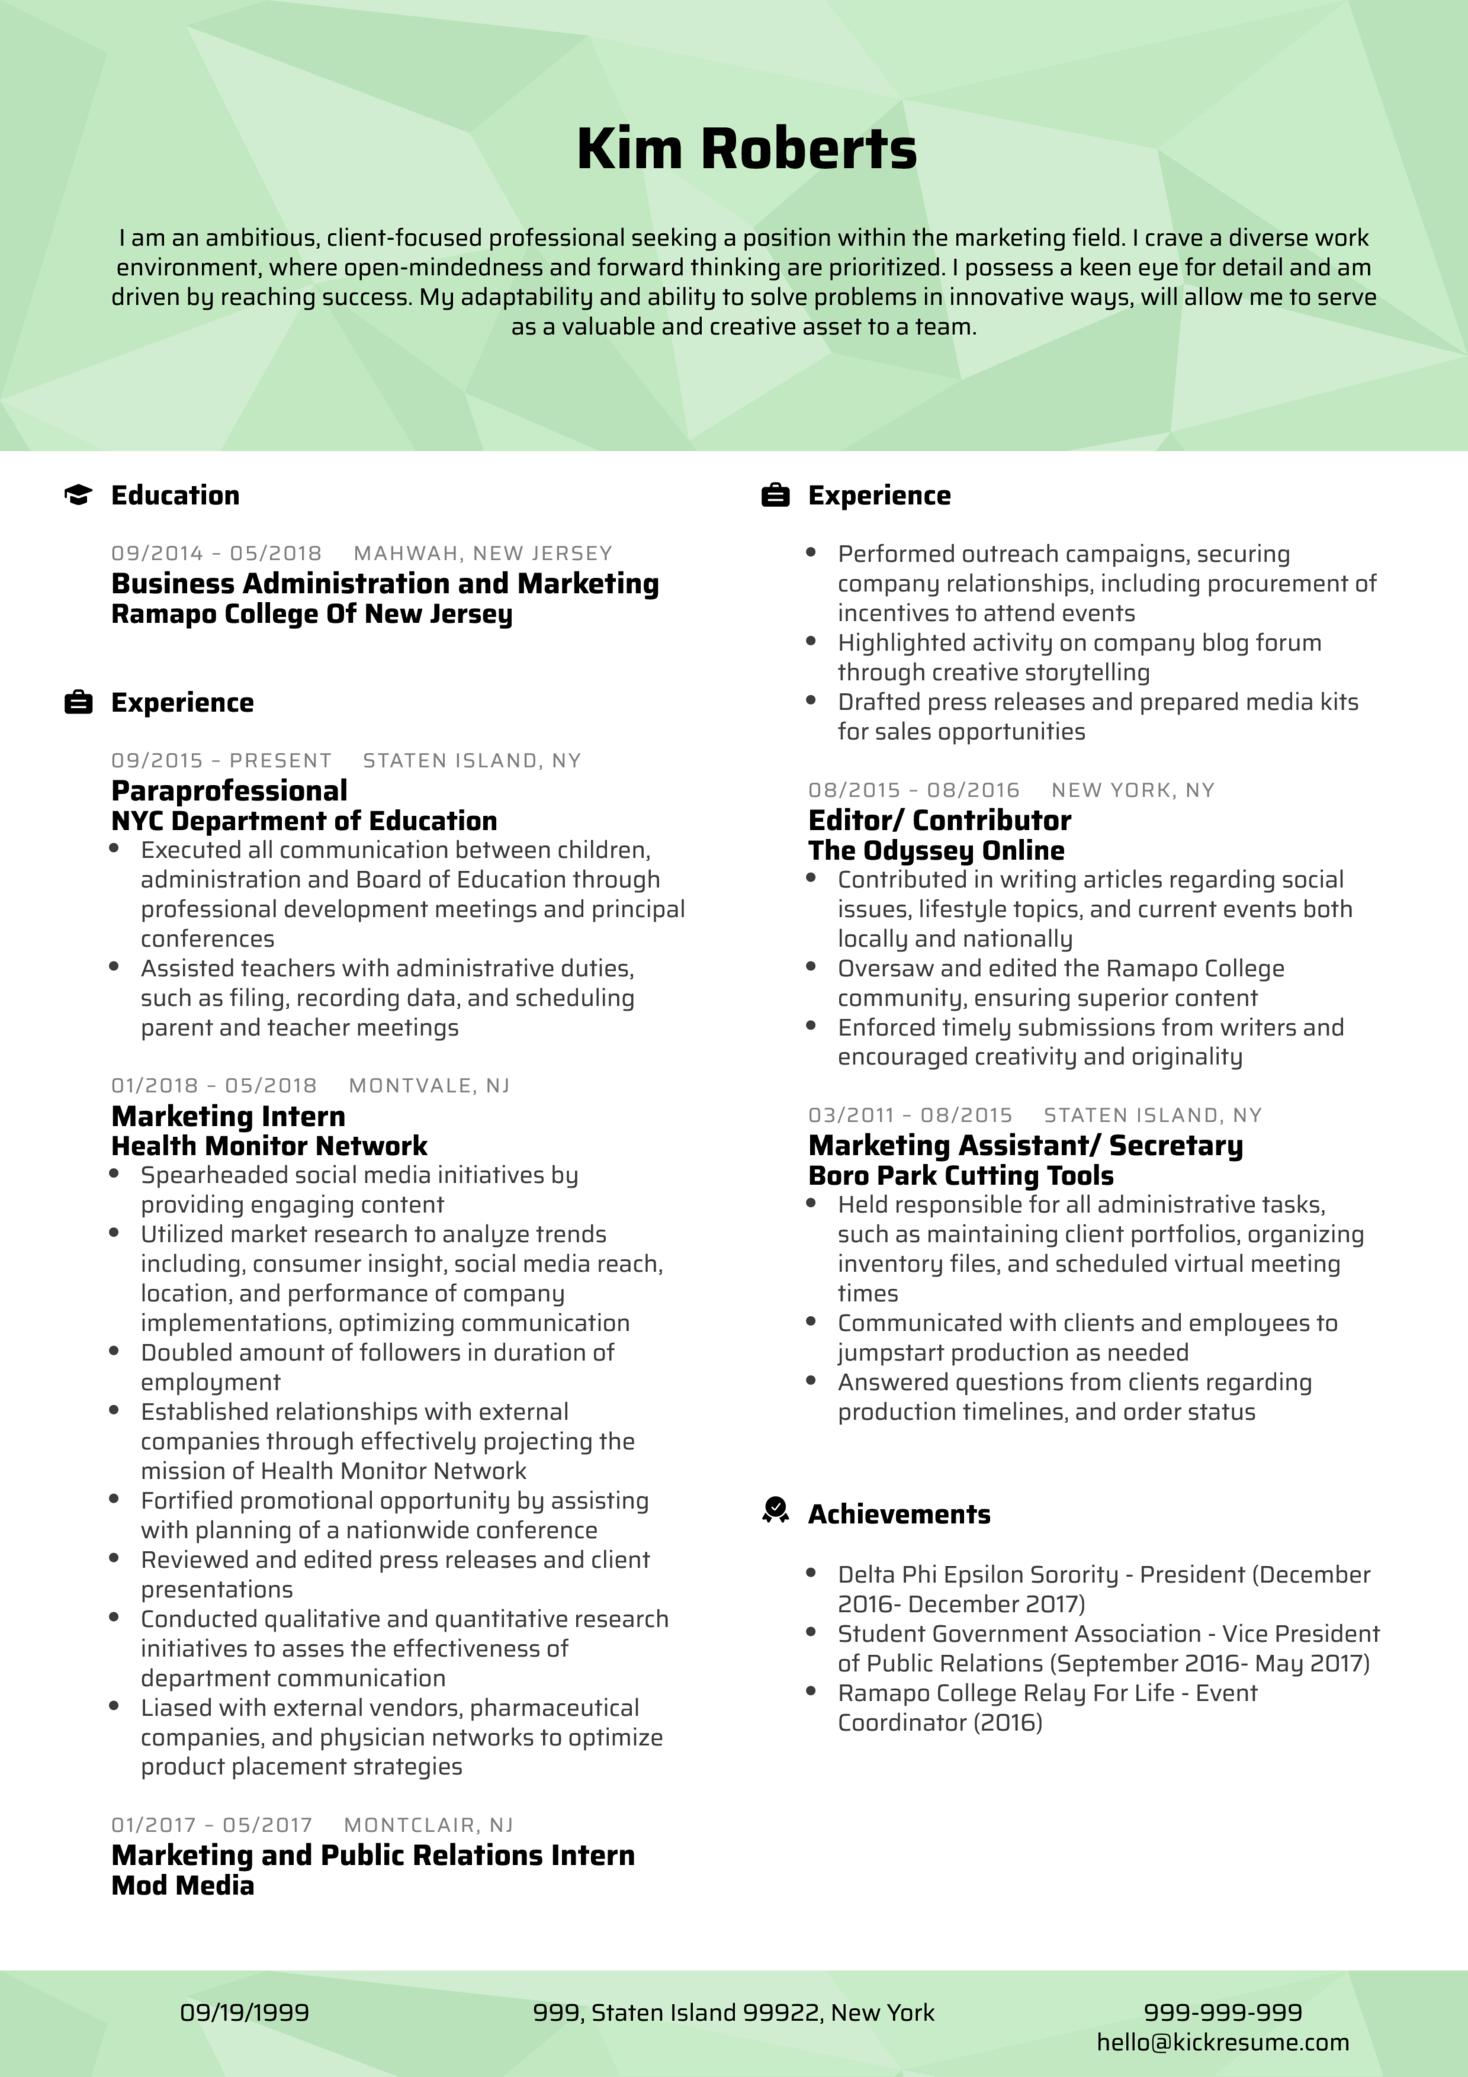 Professional Project Coordinator CV Sample (Parte 1)